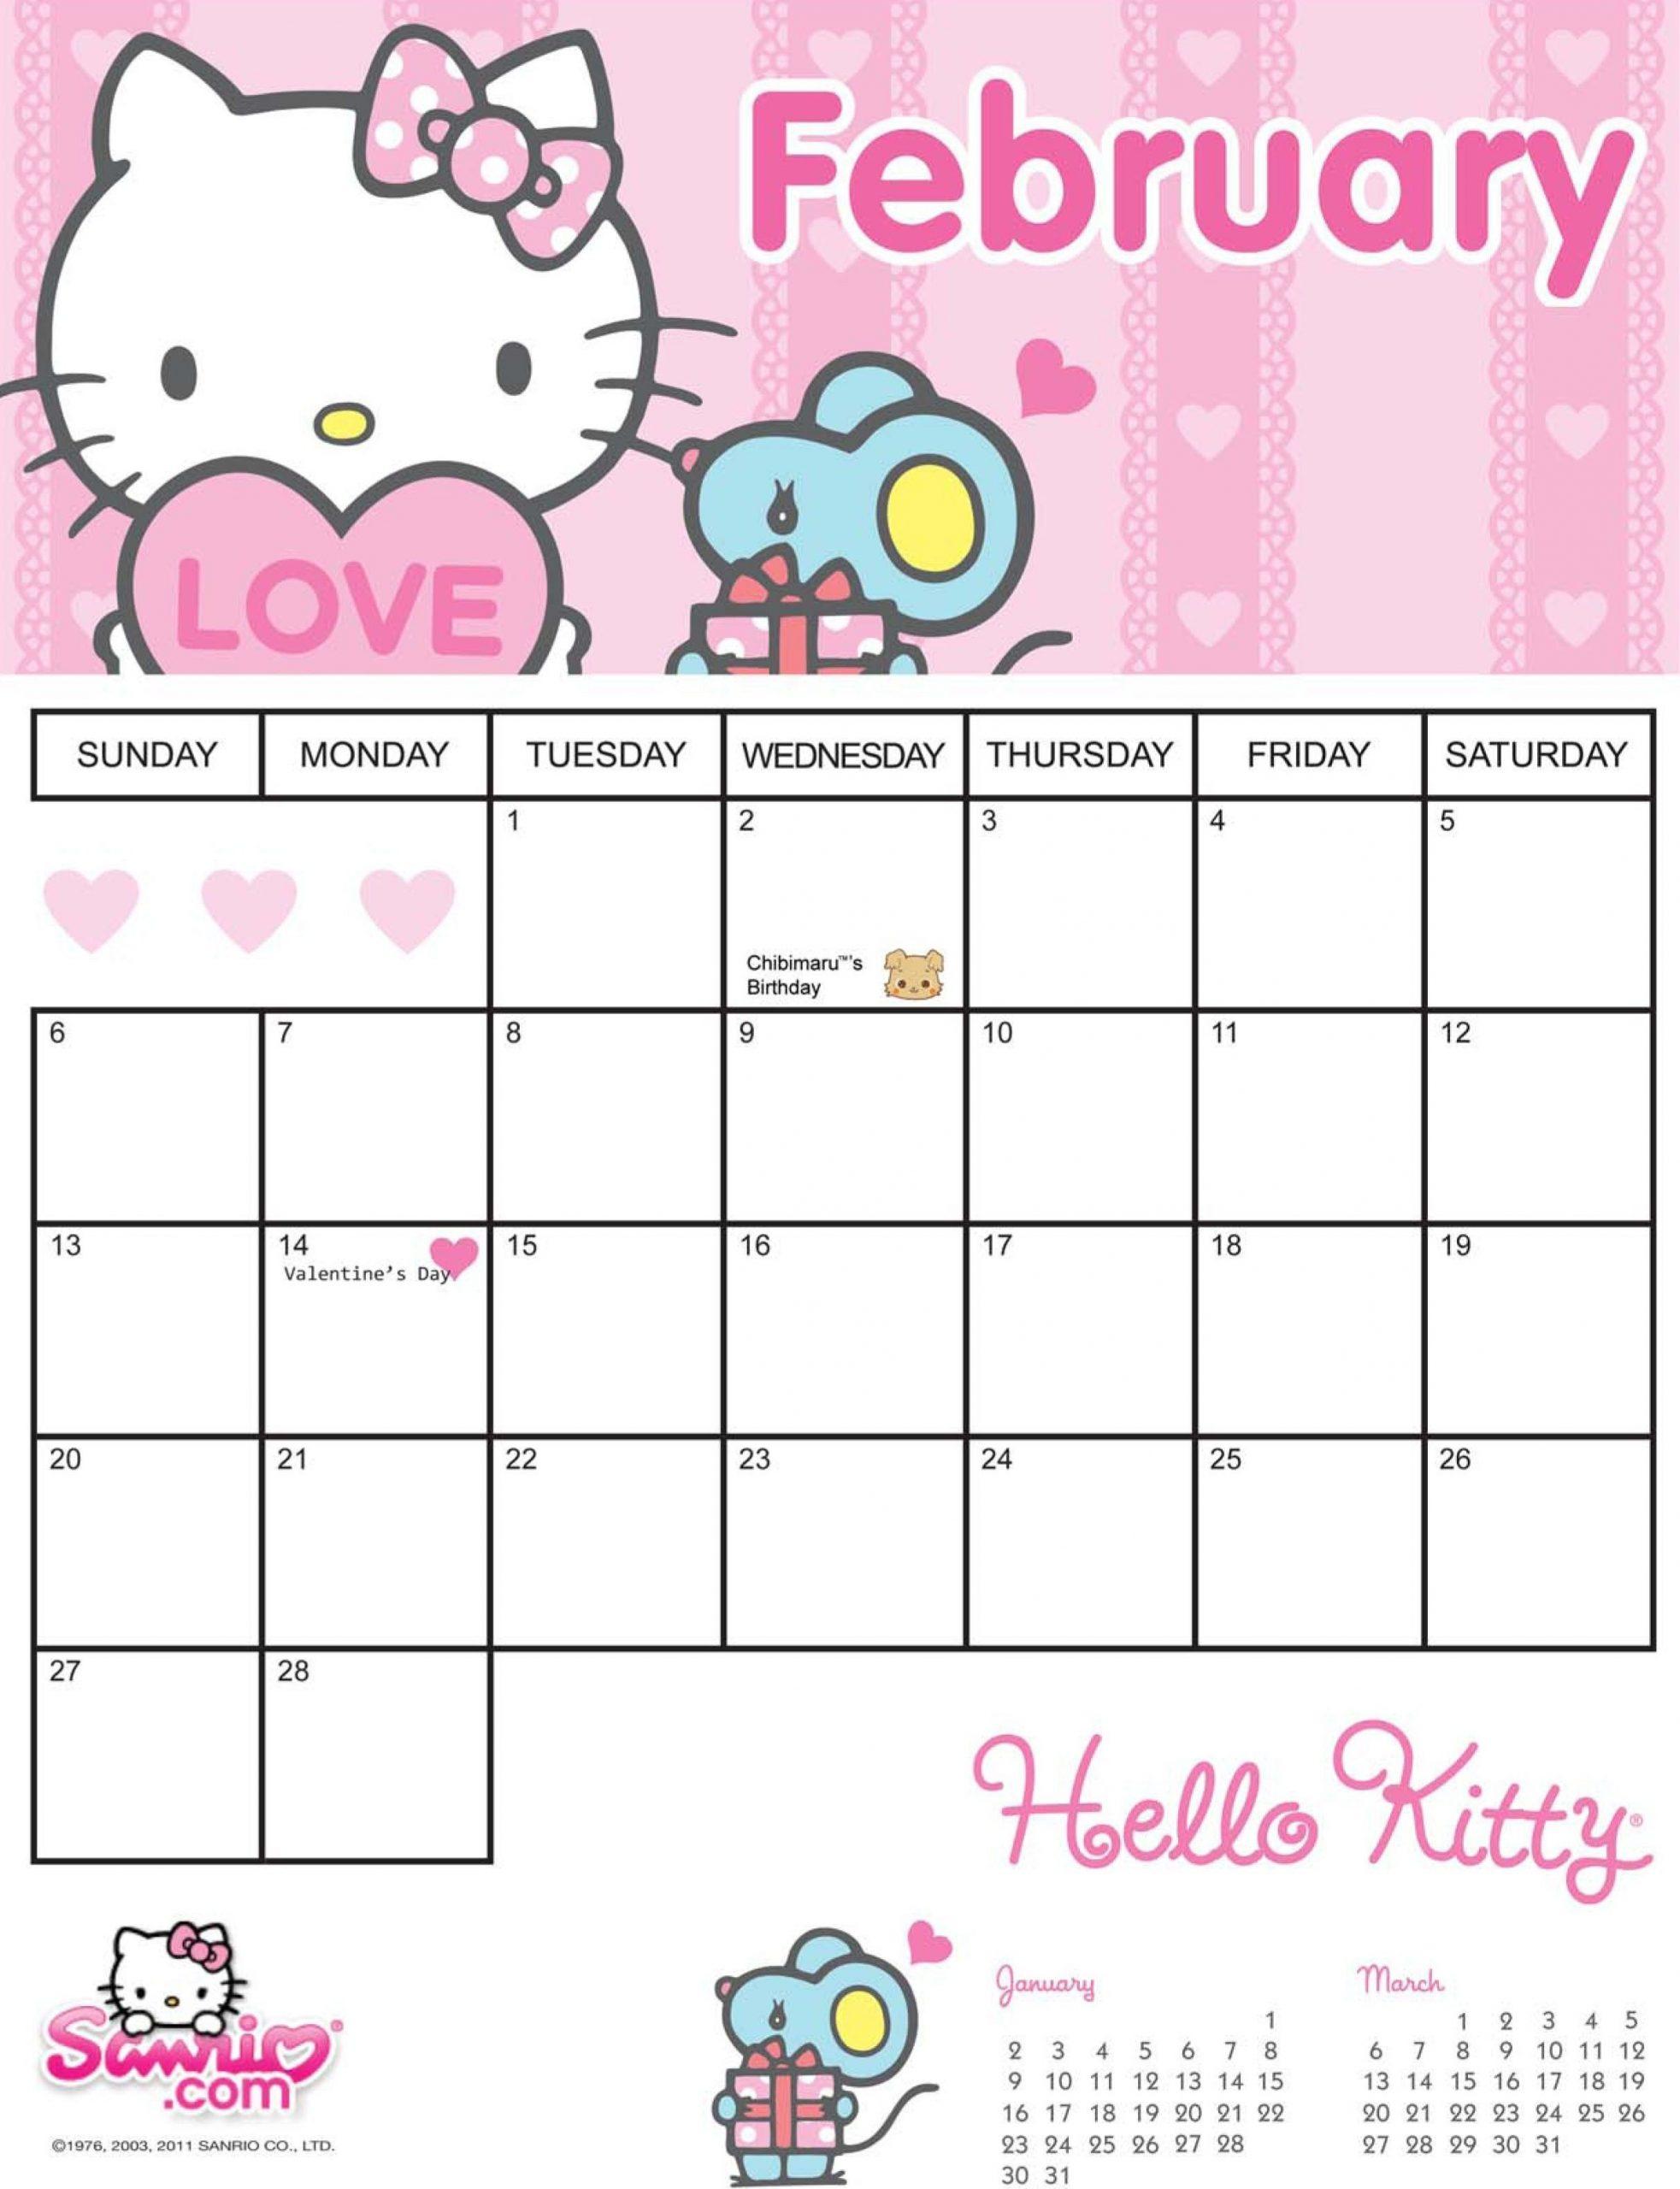 Hello Kitty February 2011 Printable Calendar   Printable